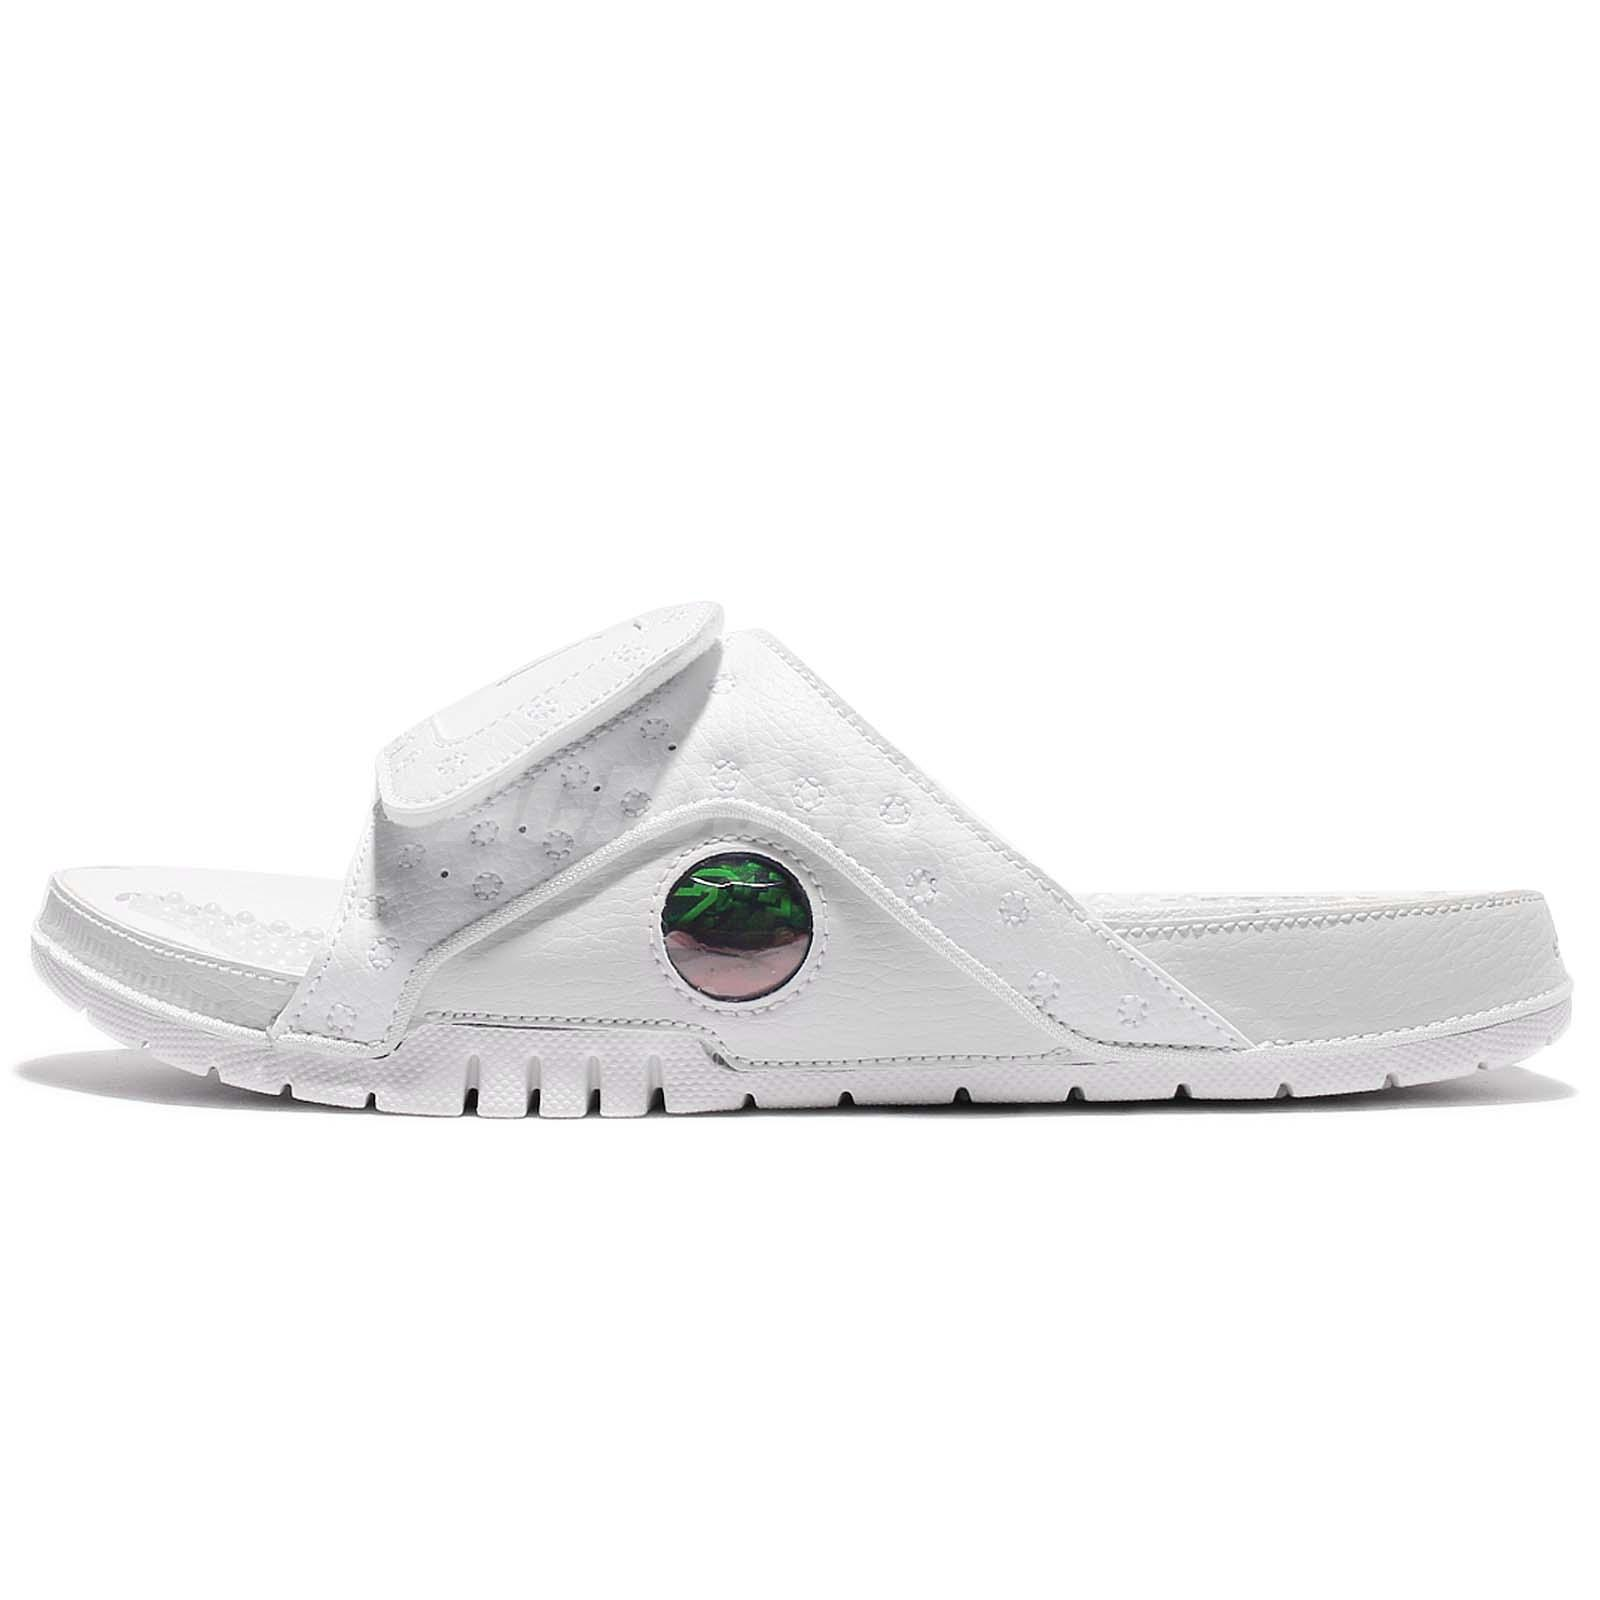 06bacef99a9 jordan retro 13 sandals Sale,up to 62% Discounts